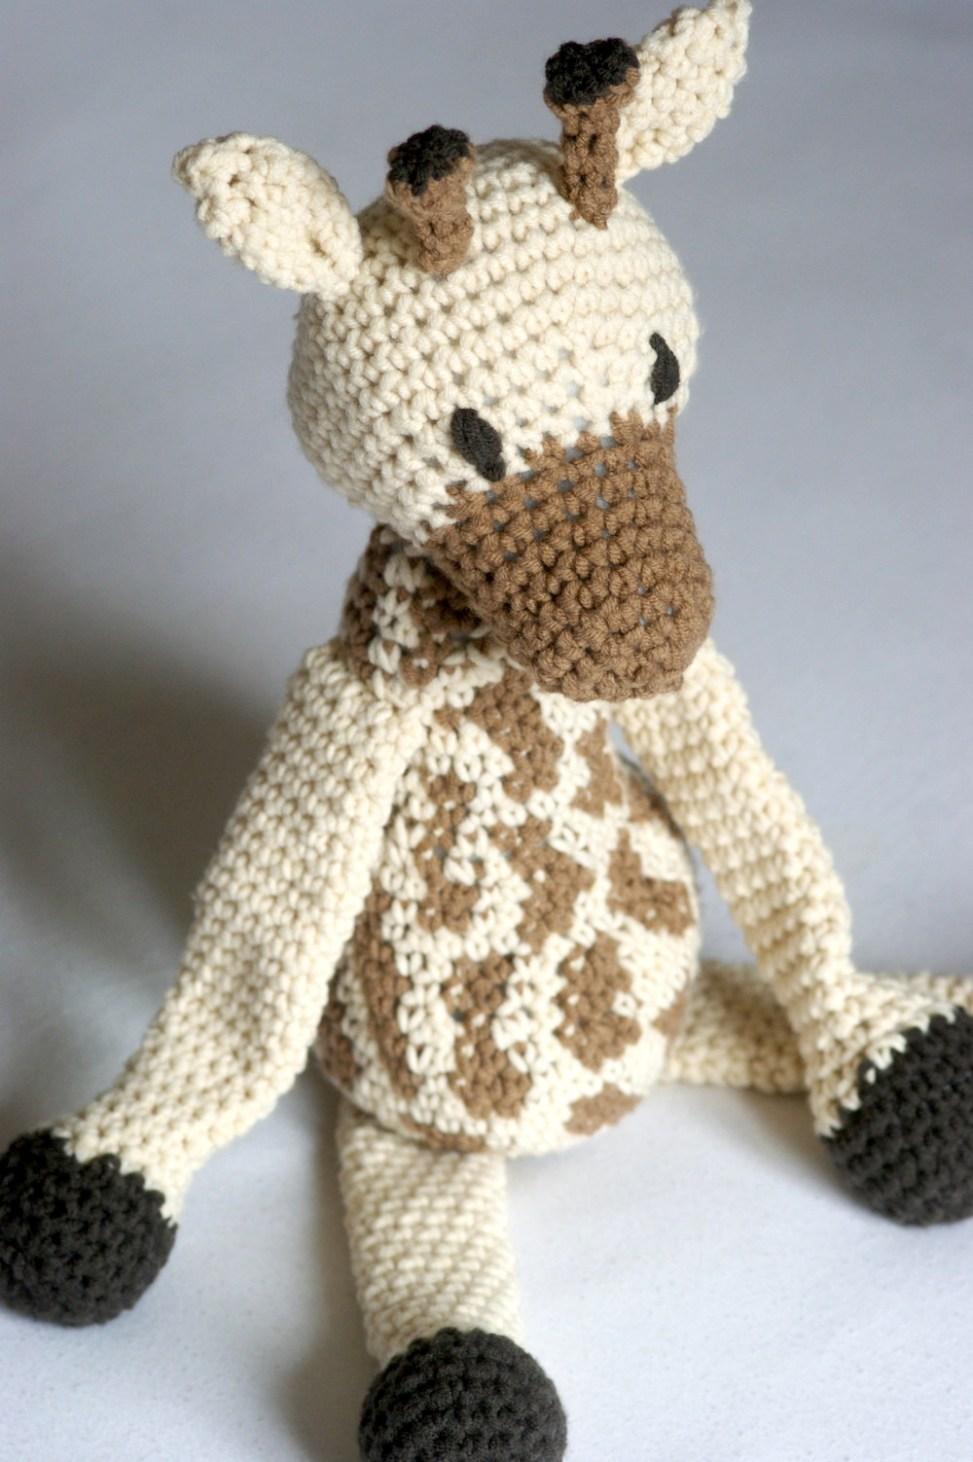 Caitlin die Giraffe – collection oberschin